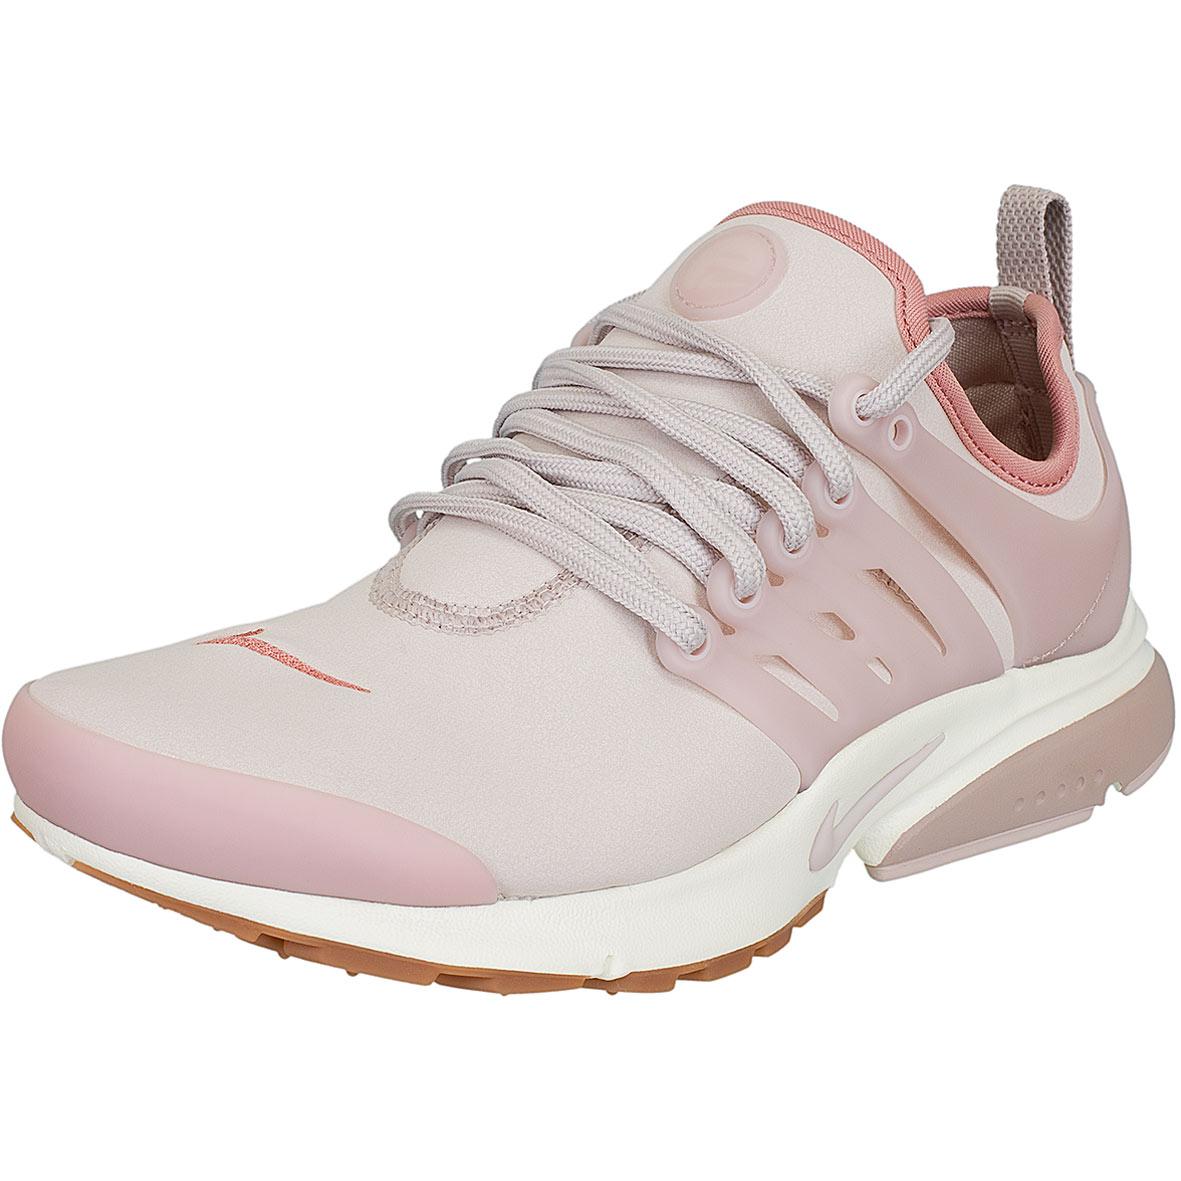 nike damen sneaker air presto premium rosa hier bestellen. Black Bedroom Furniture Sets. Home Design Ideas